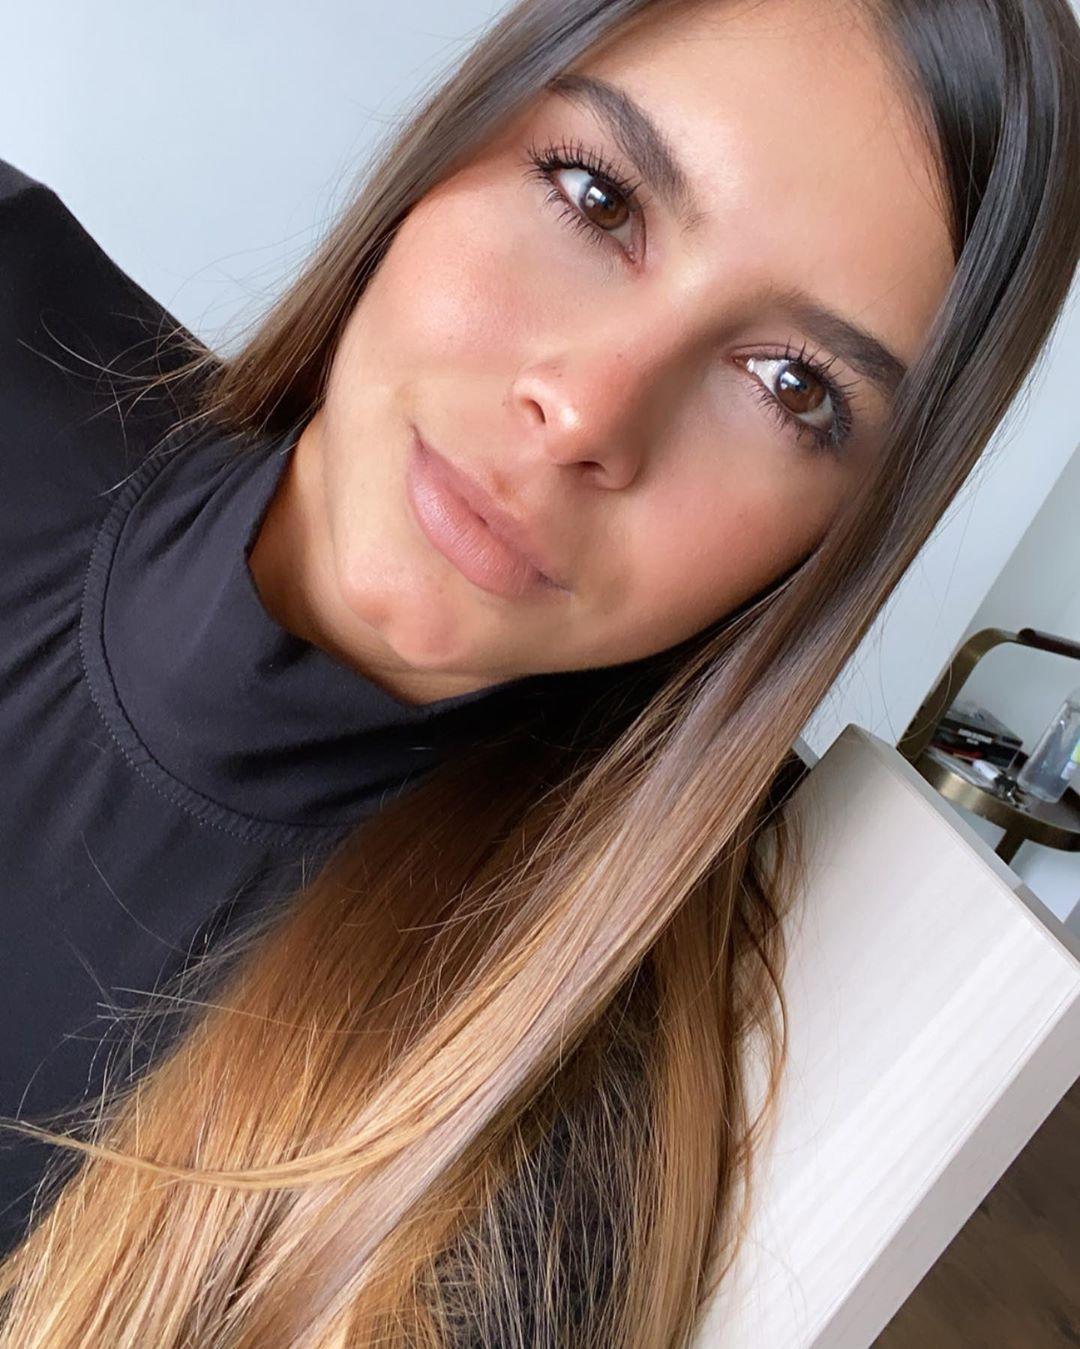 Daniela-Medina-Wallpapers-Insta-FIt-Bio-8